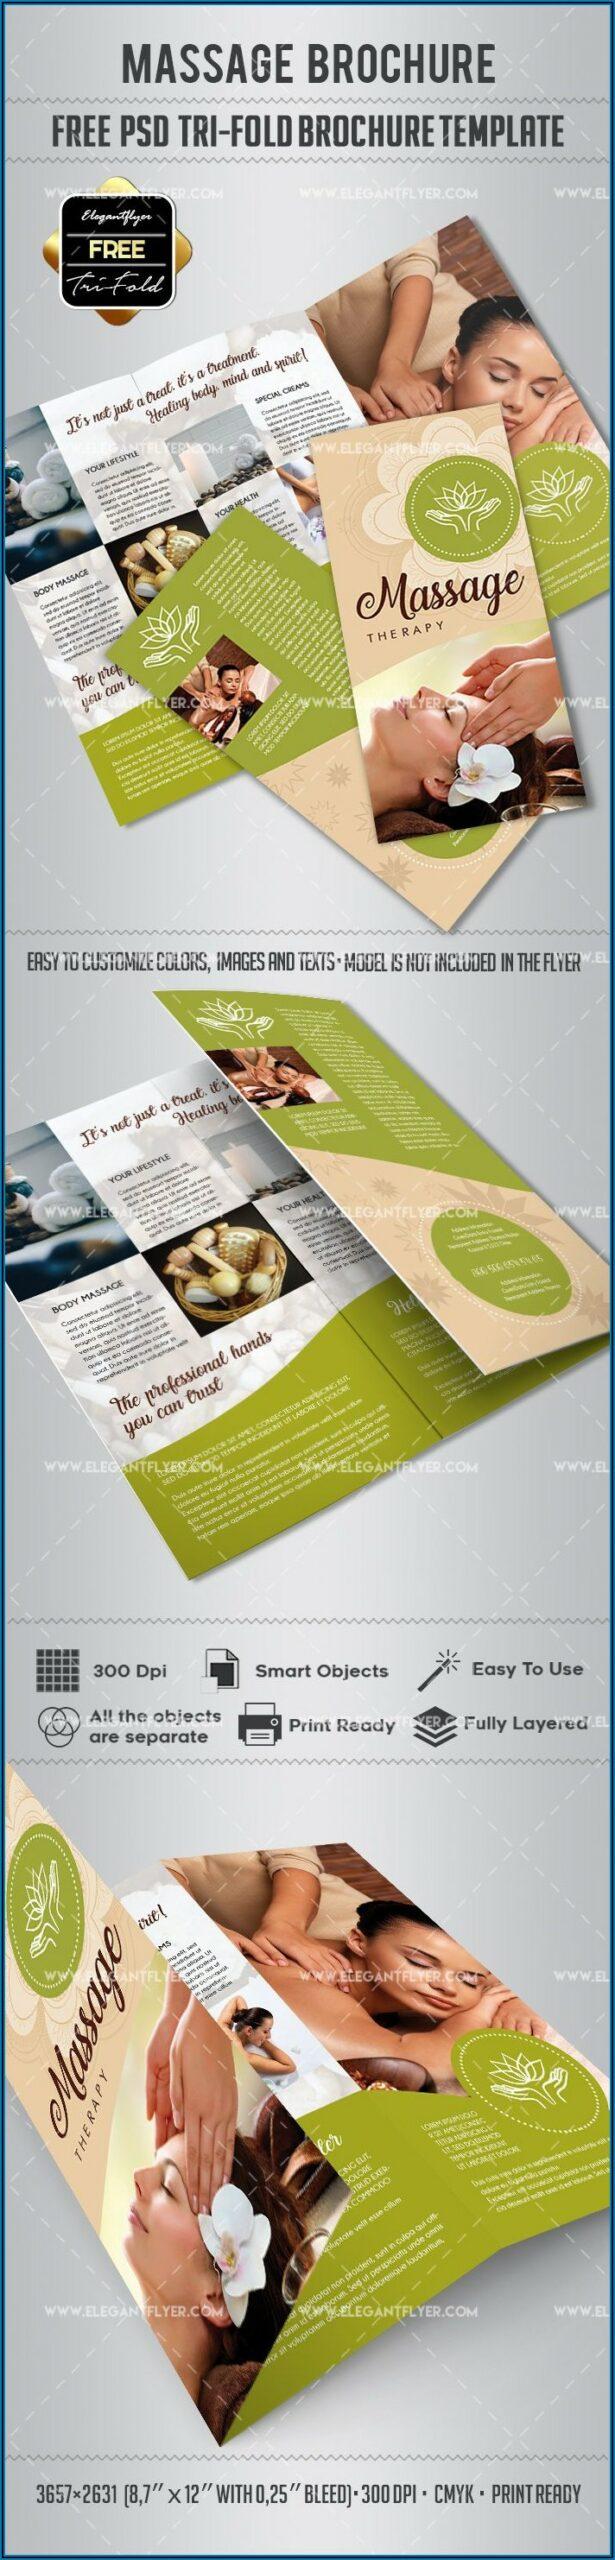 Massage Brochure Template Free